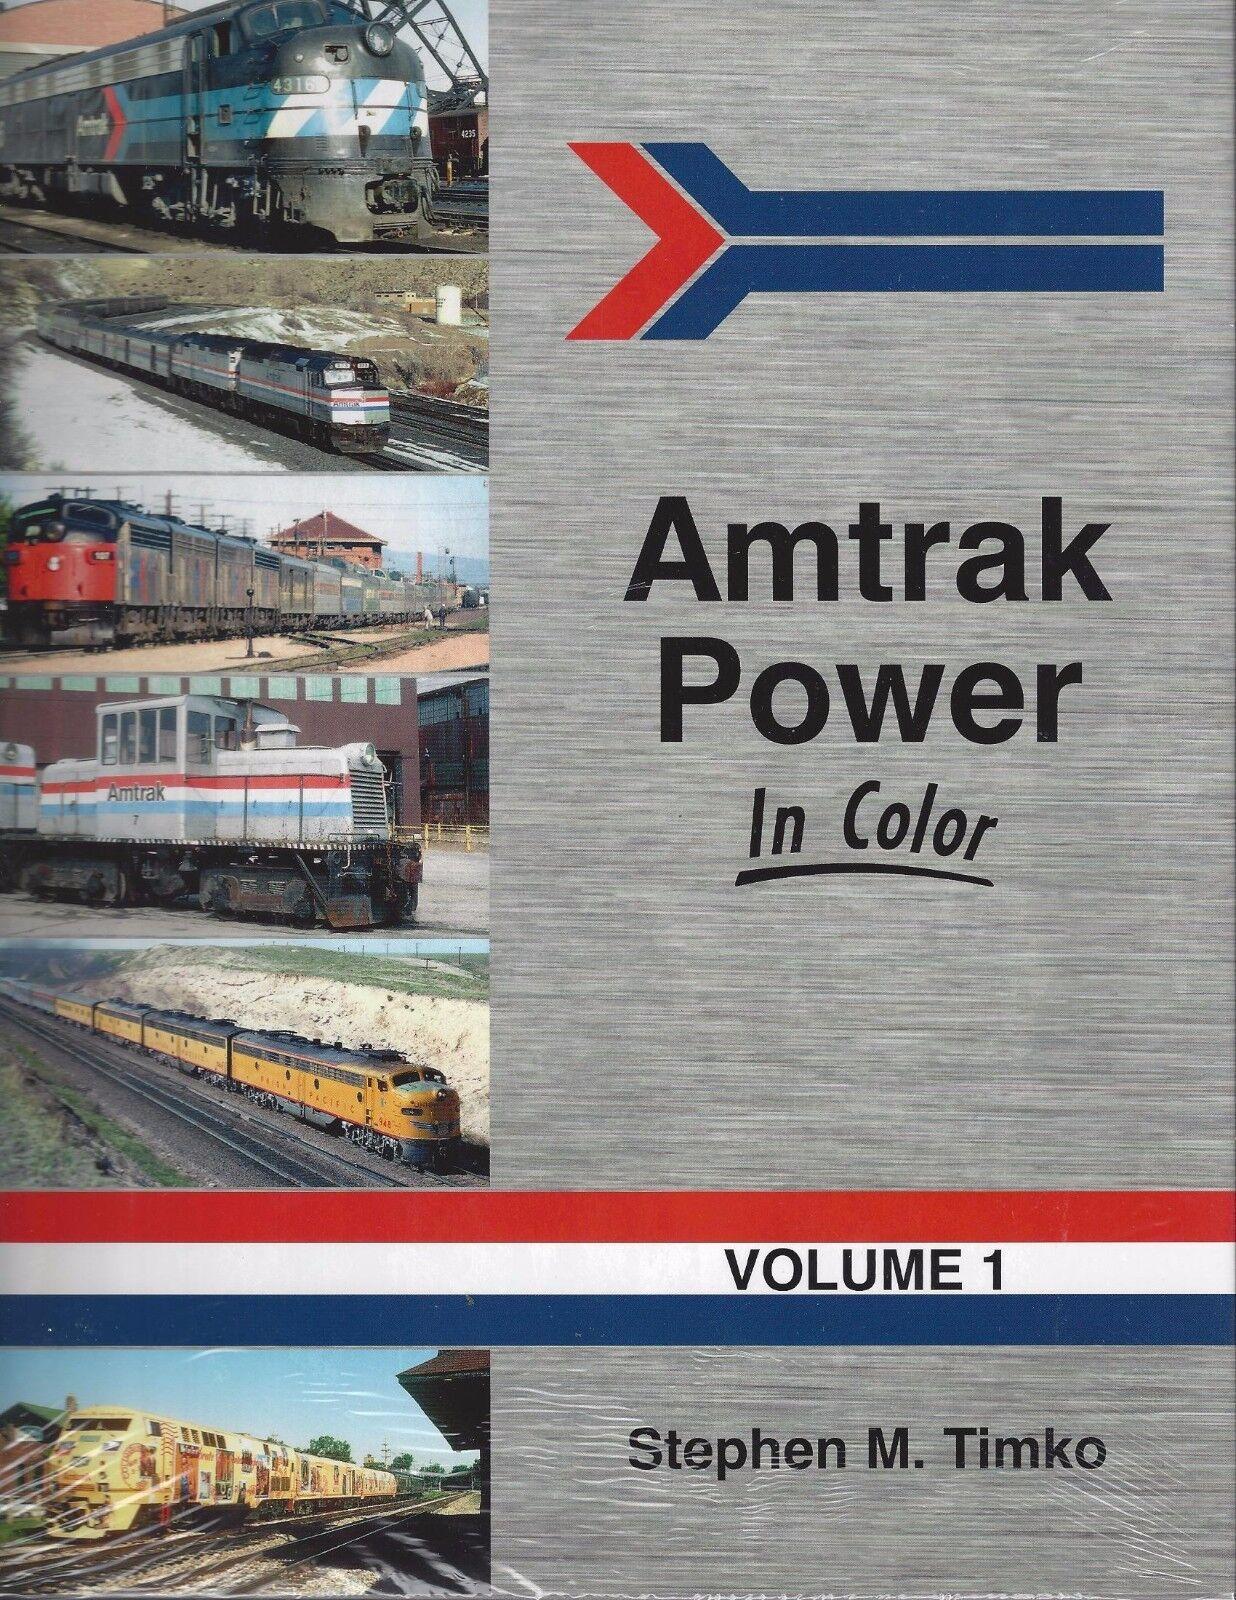 Amtrak Potenza in Colore, Vol. 1 - Originale Amtrak  1 - 499  Nuovo Libro